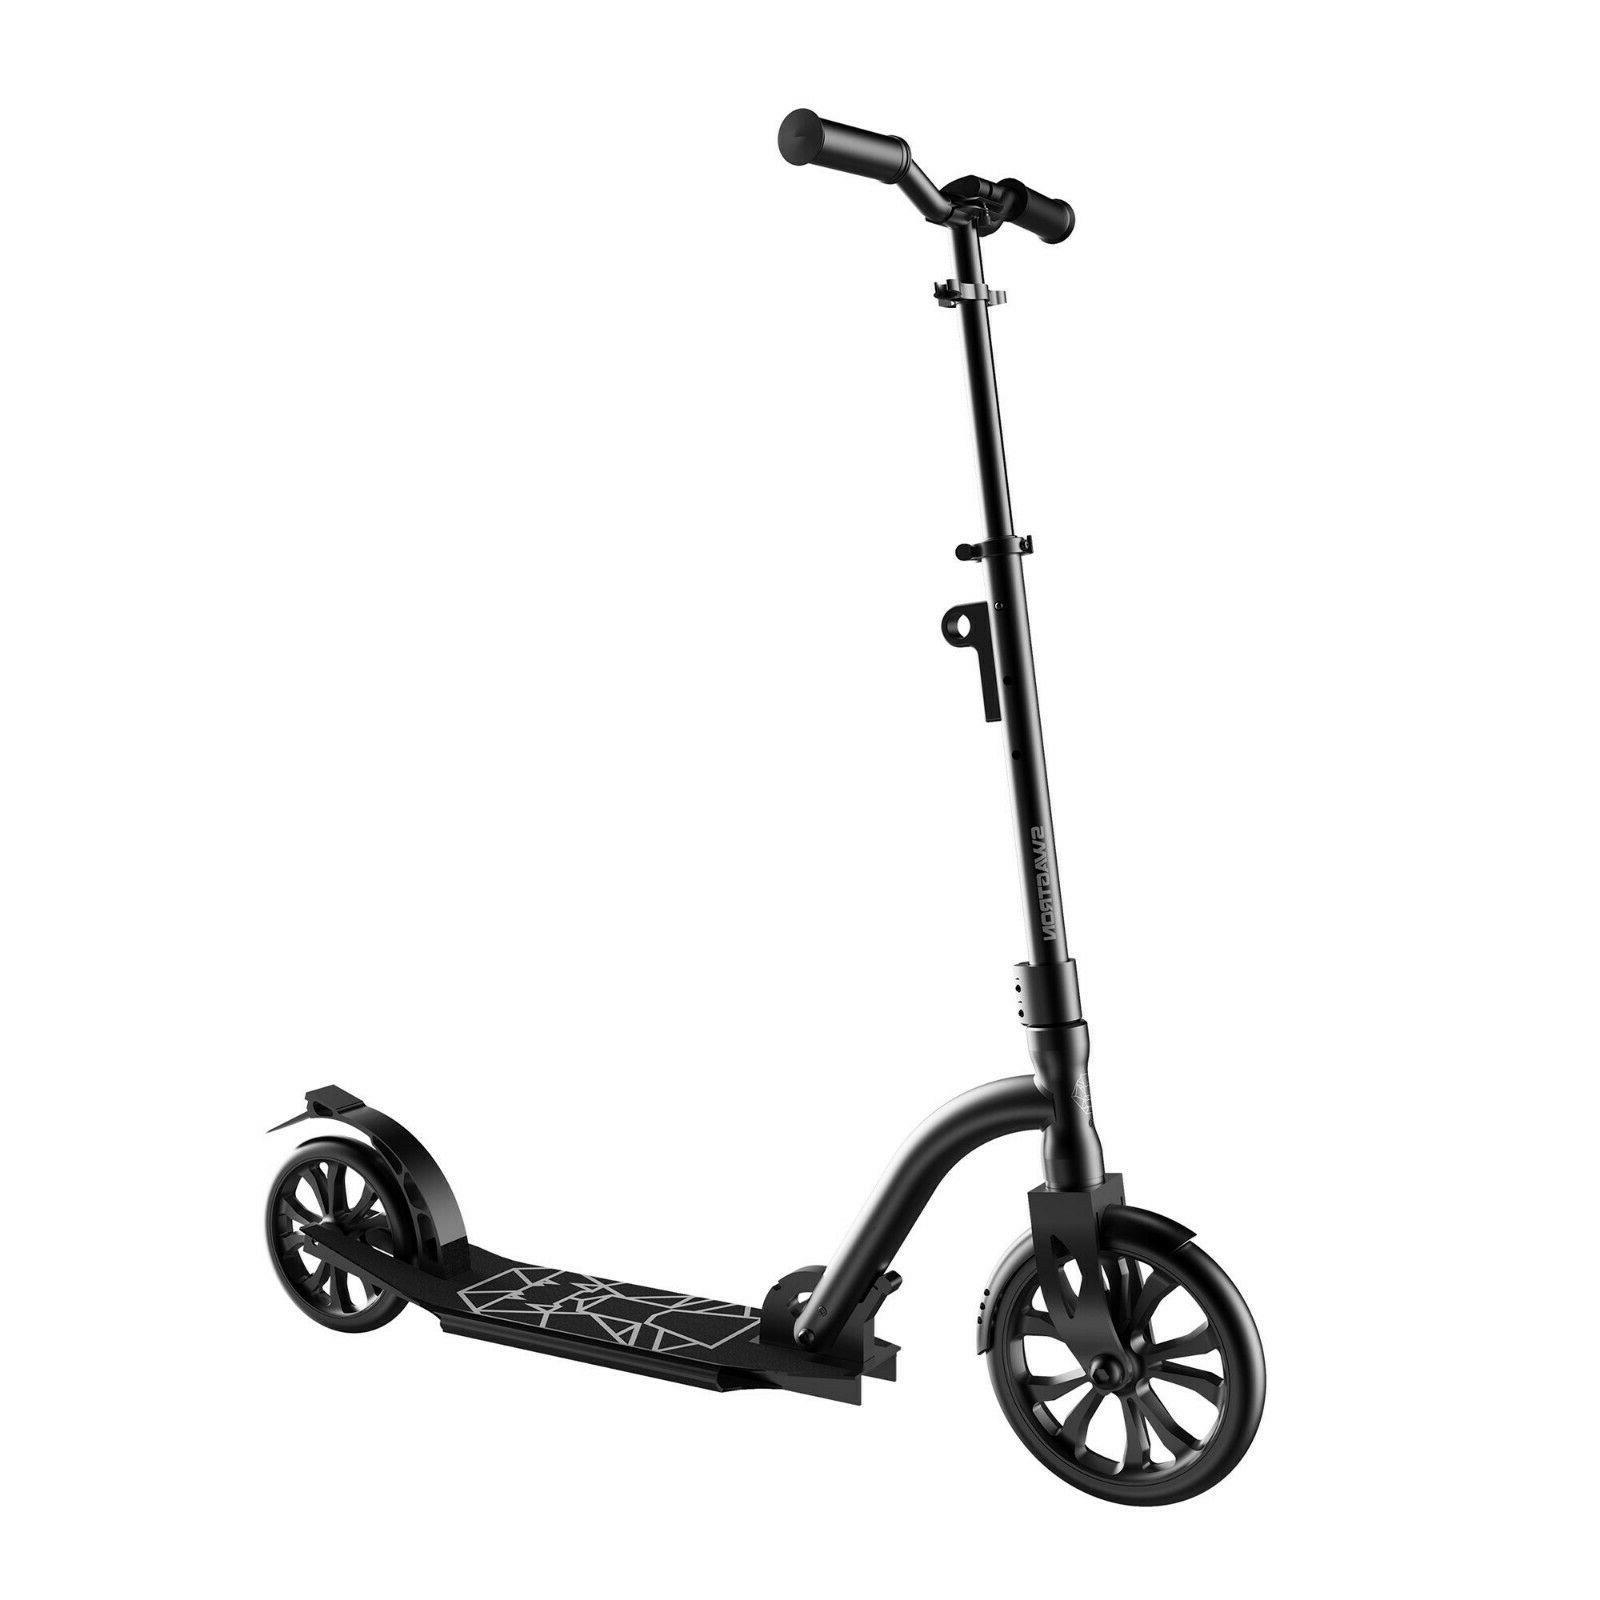 k9 commuter kick scooter adult foldable lightweight